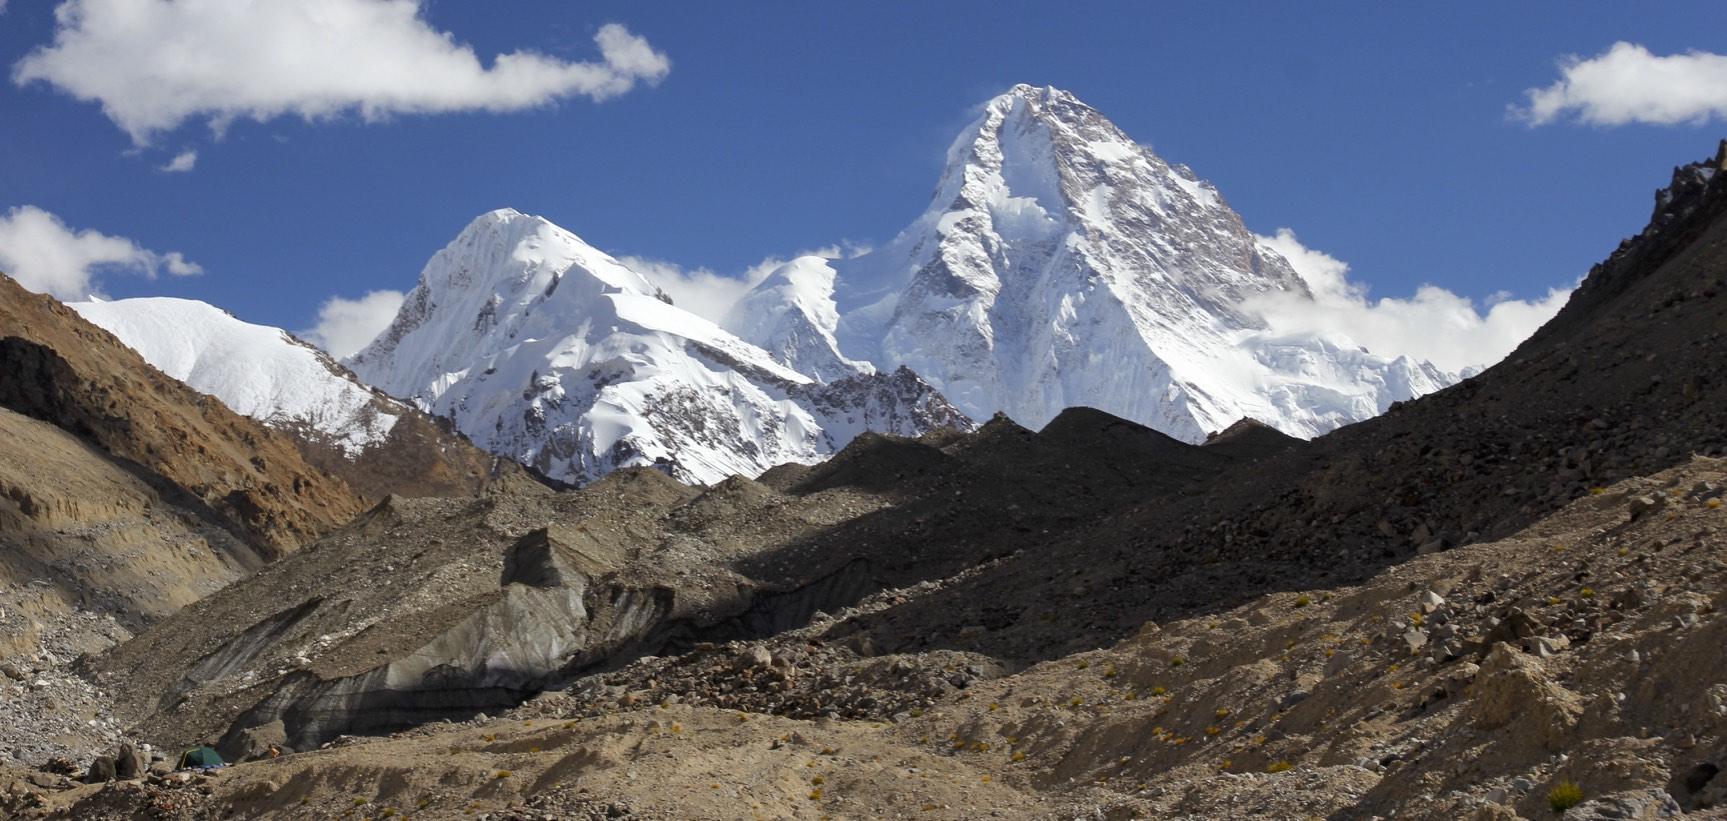 K2 Glacier and Italian BC, K2 in the distance